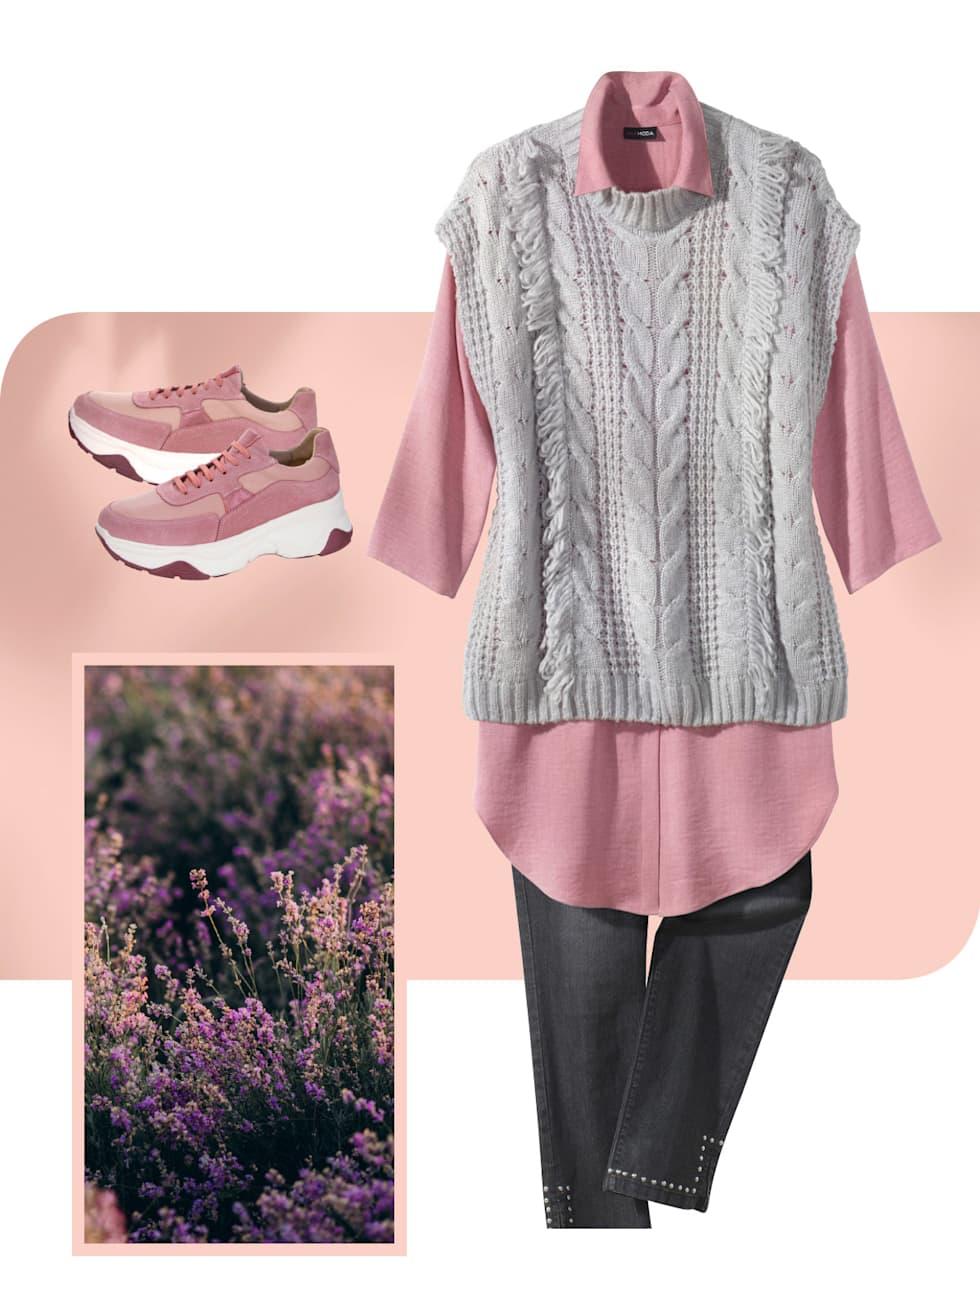 MIAMODA Große Größen Kampagne strahlende Farben - Outfit in der Farbe lila